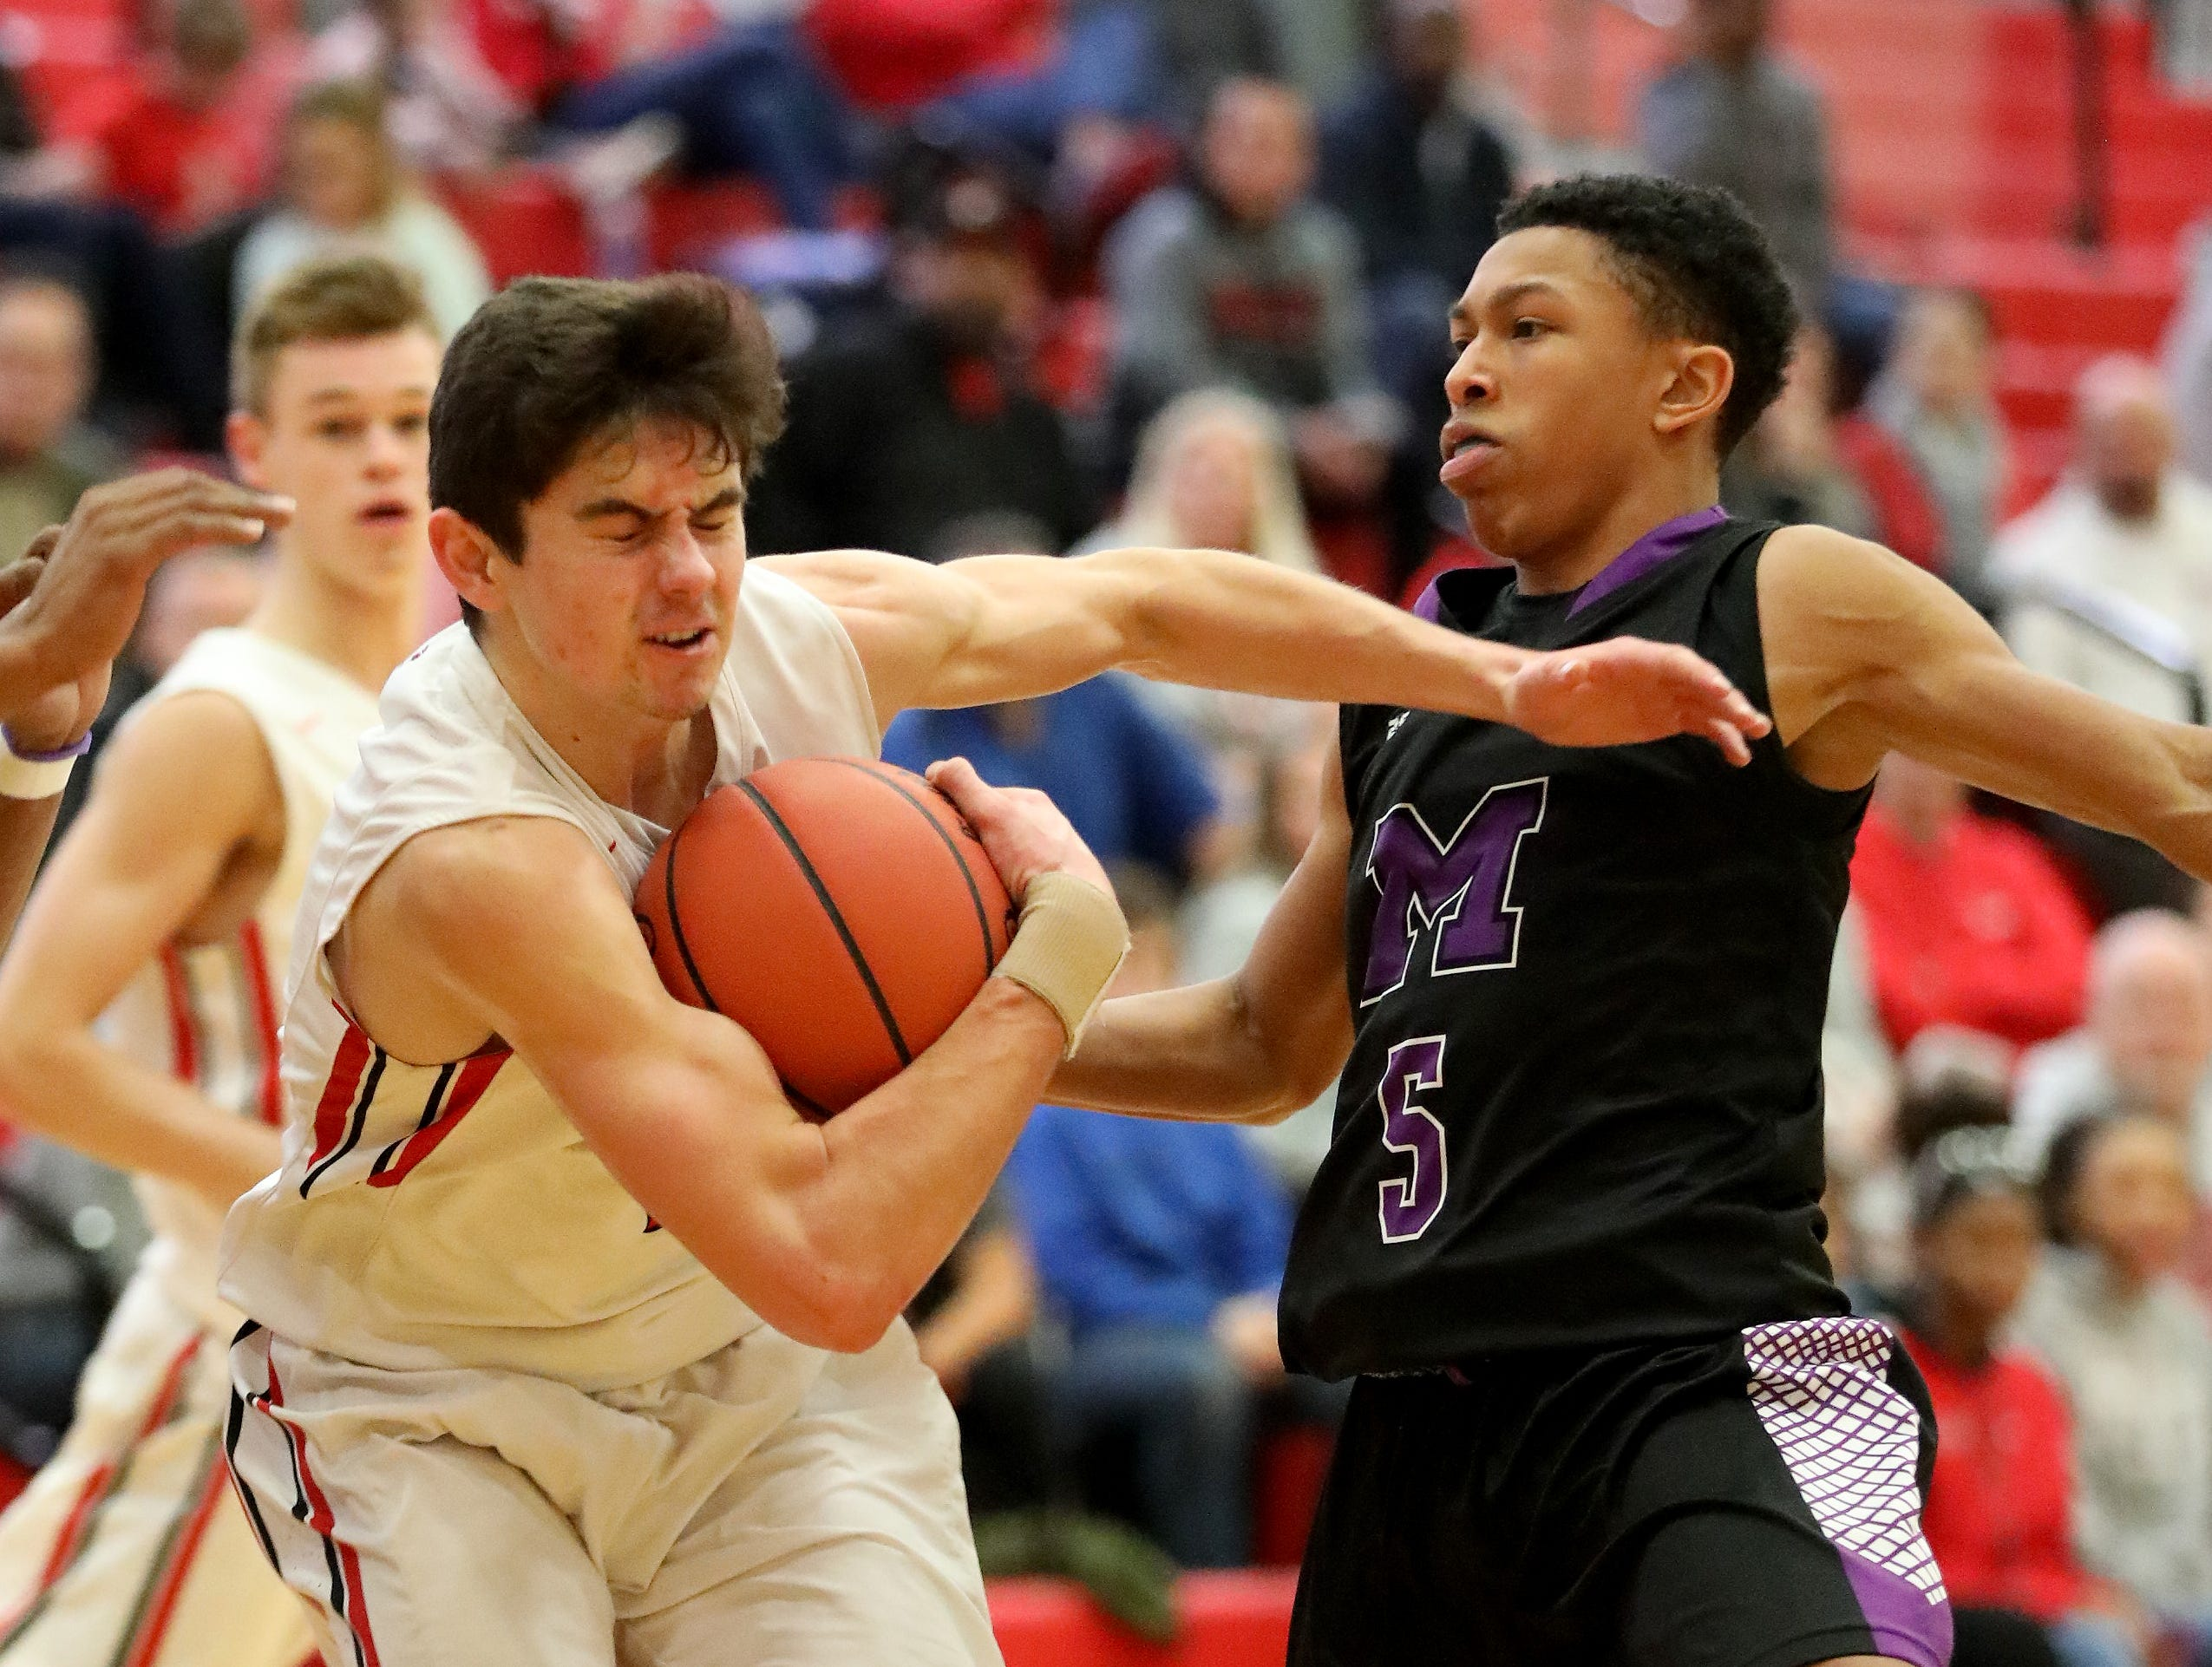 Lakota West guard Matt Desalvo (5) drives to the  basket against Middletown guard Kadar Gardner during their  basketball game , Tuesday, Dec. 11,2018. West won 64-56.